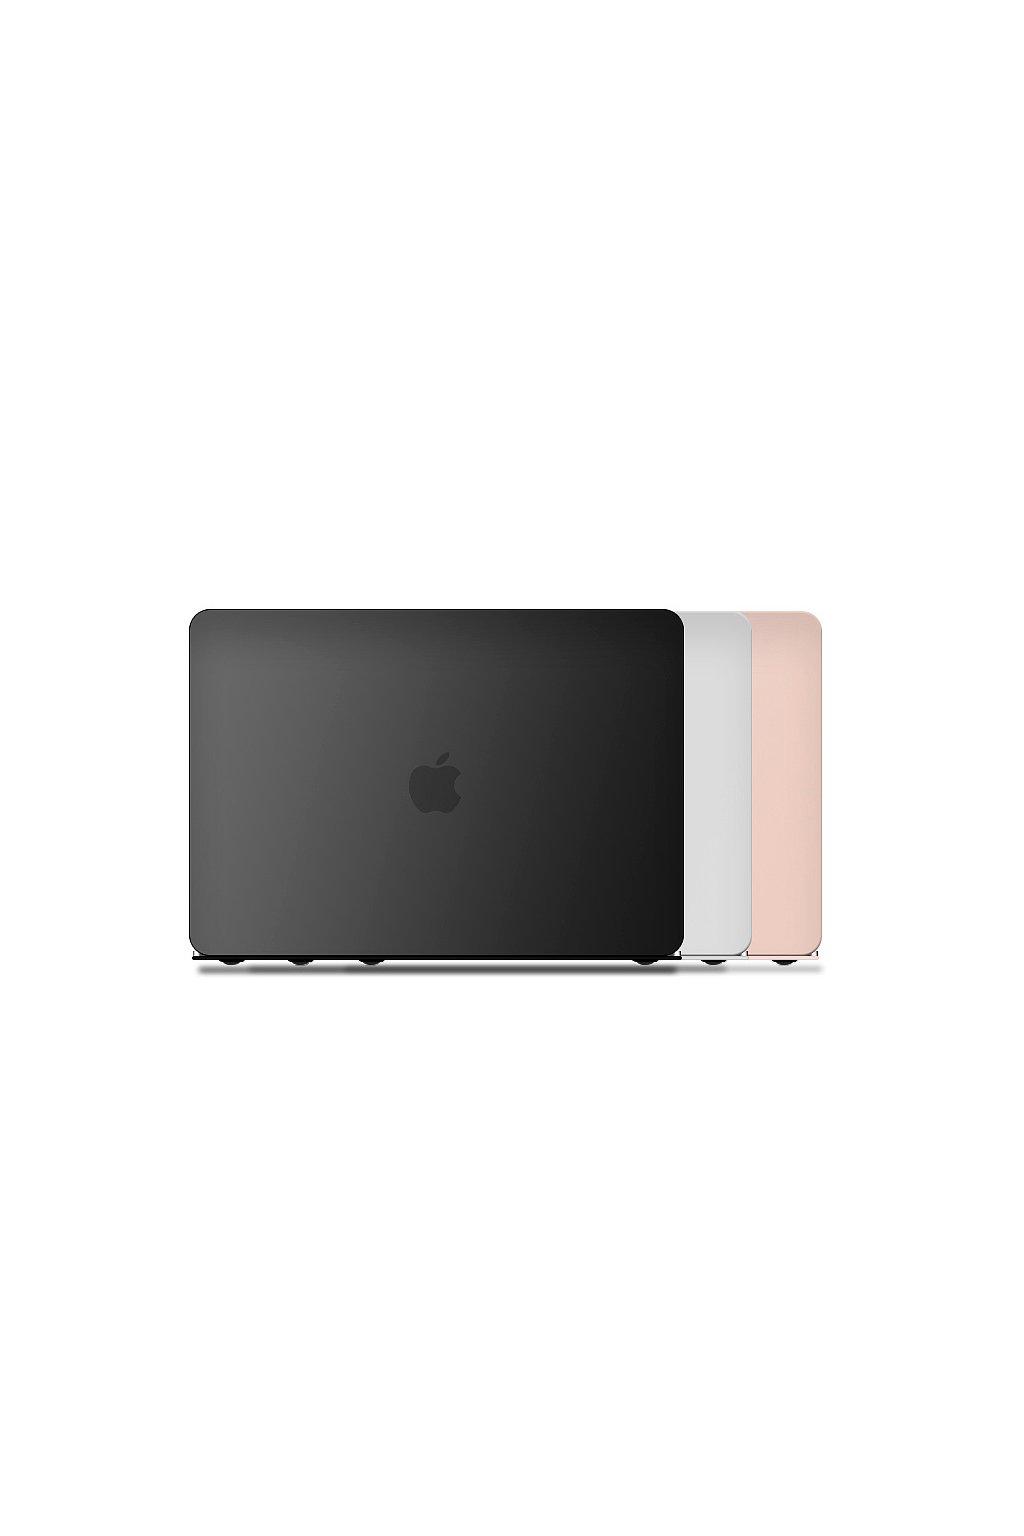 "WiWU iShield Ochrana pro Apple Macbook Air 13"""